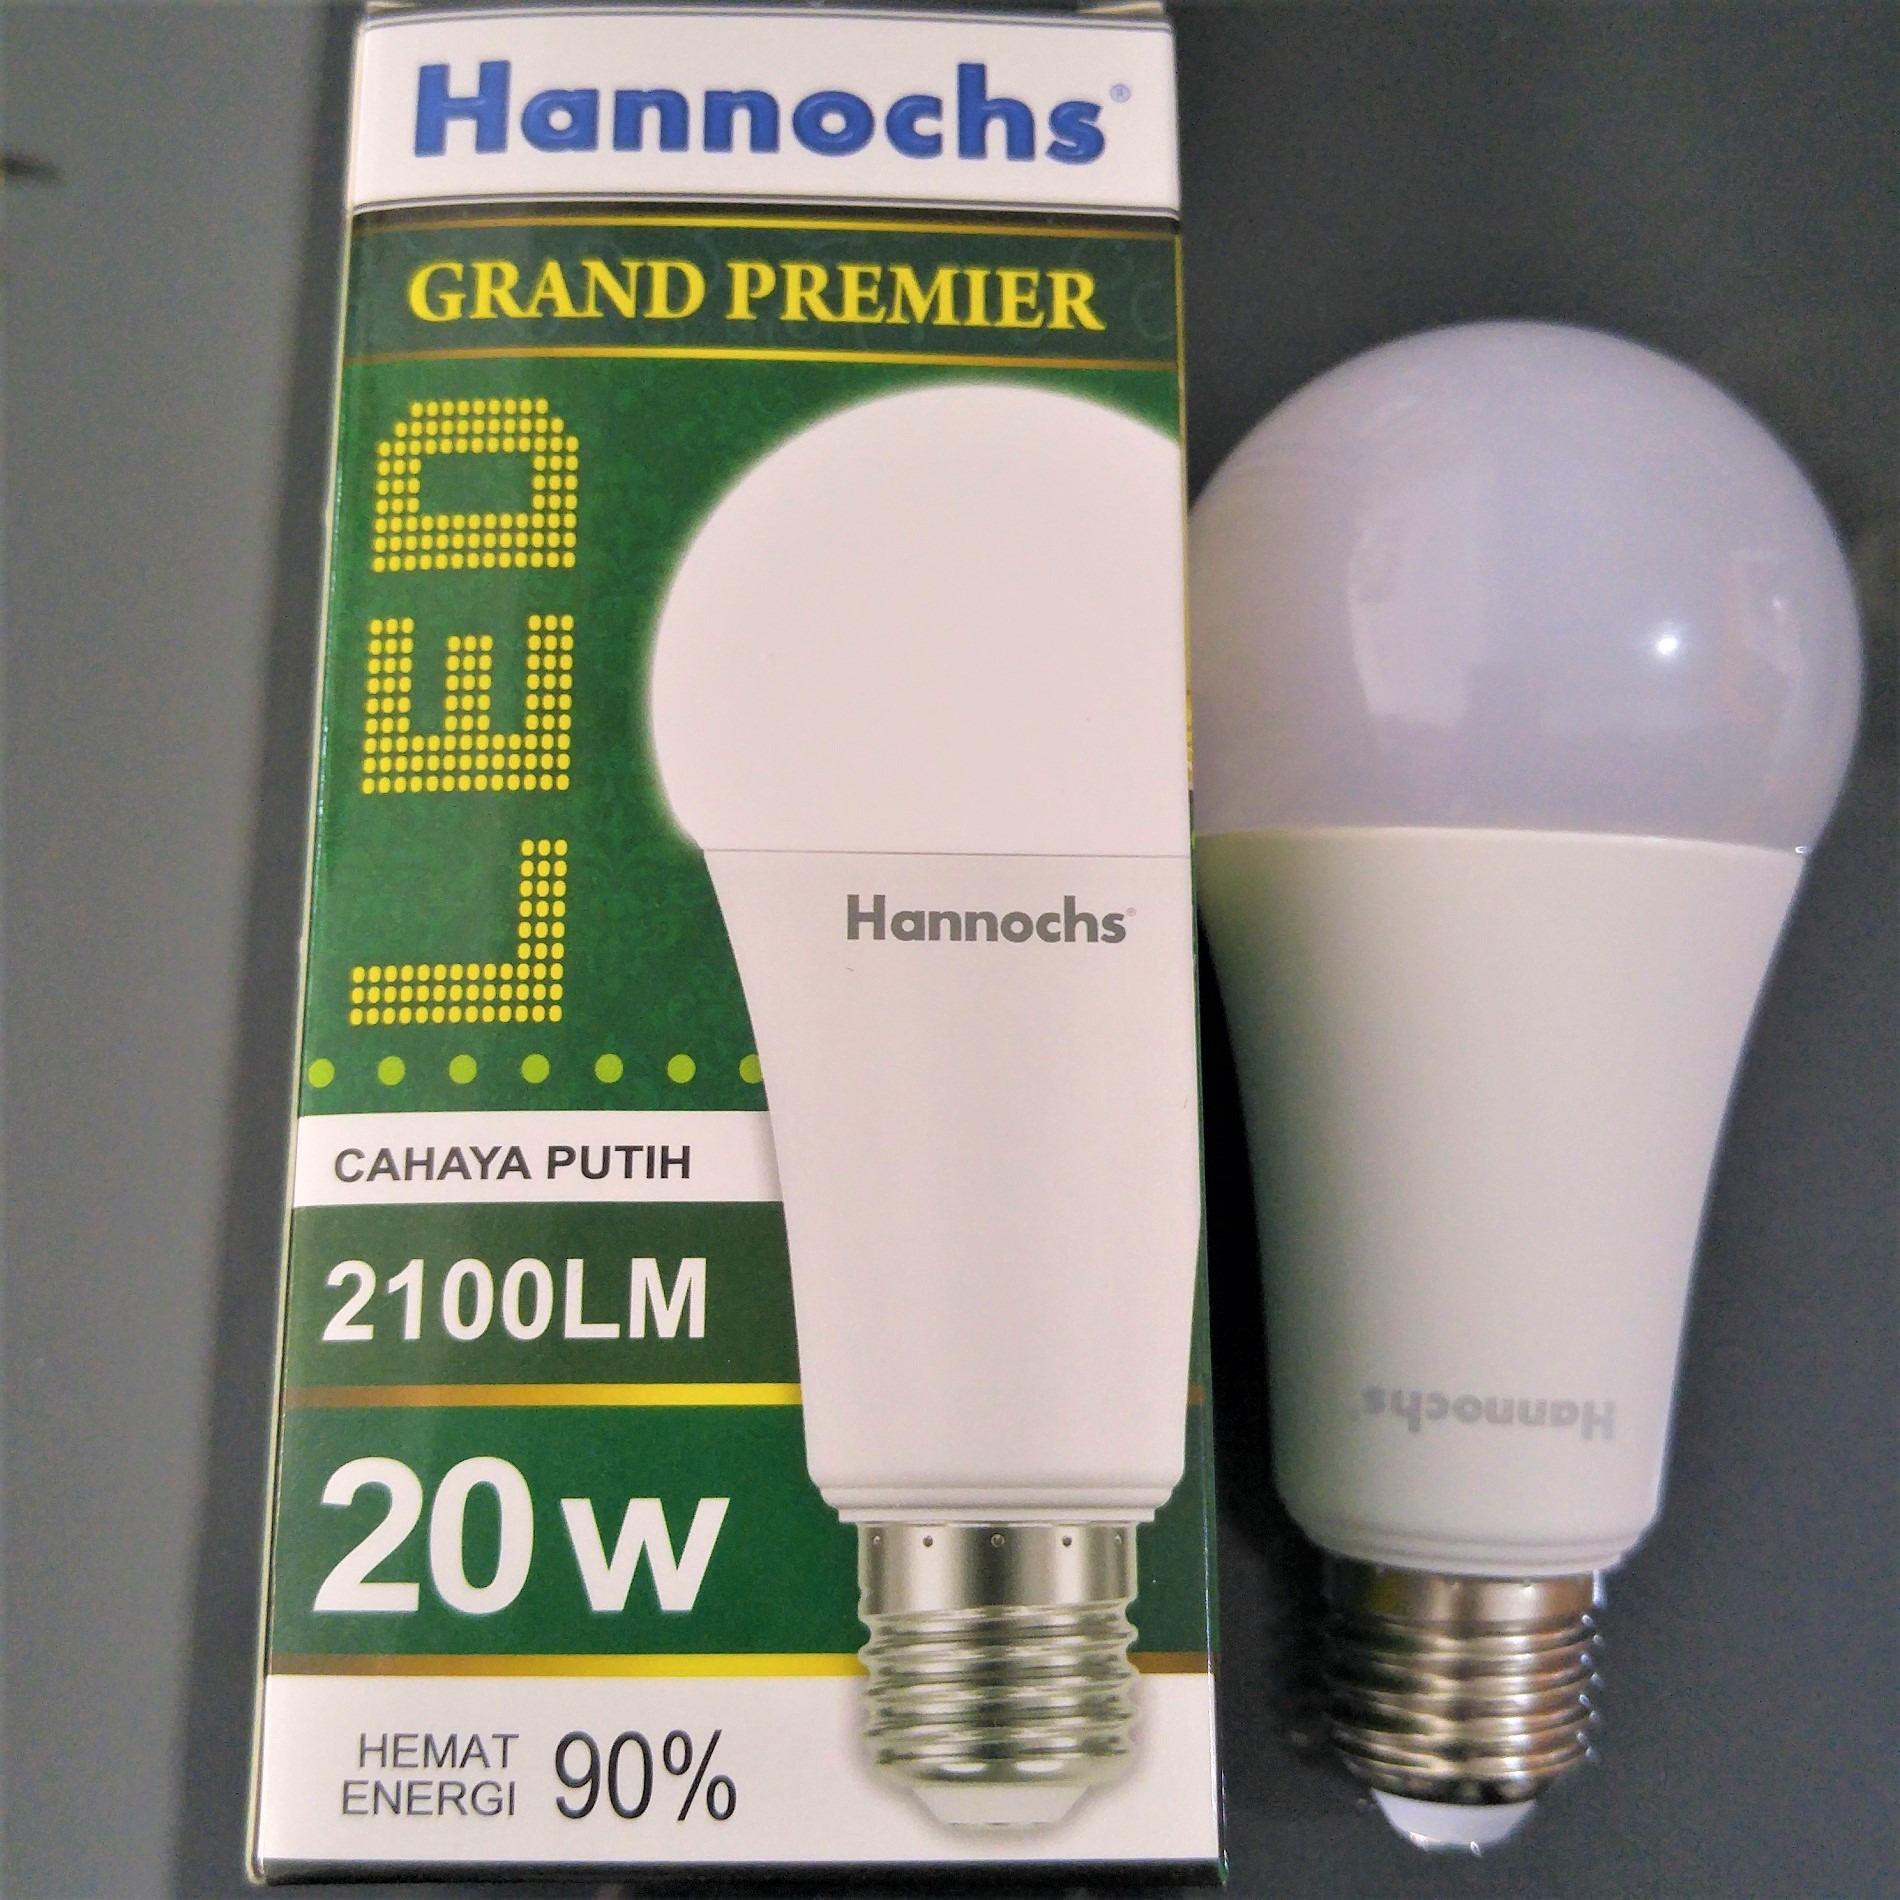 Buy Sell Cheapest Hannochs Grand Premier Best Quality Product Lampu Led 3 Watt Bola 20w